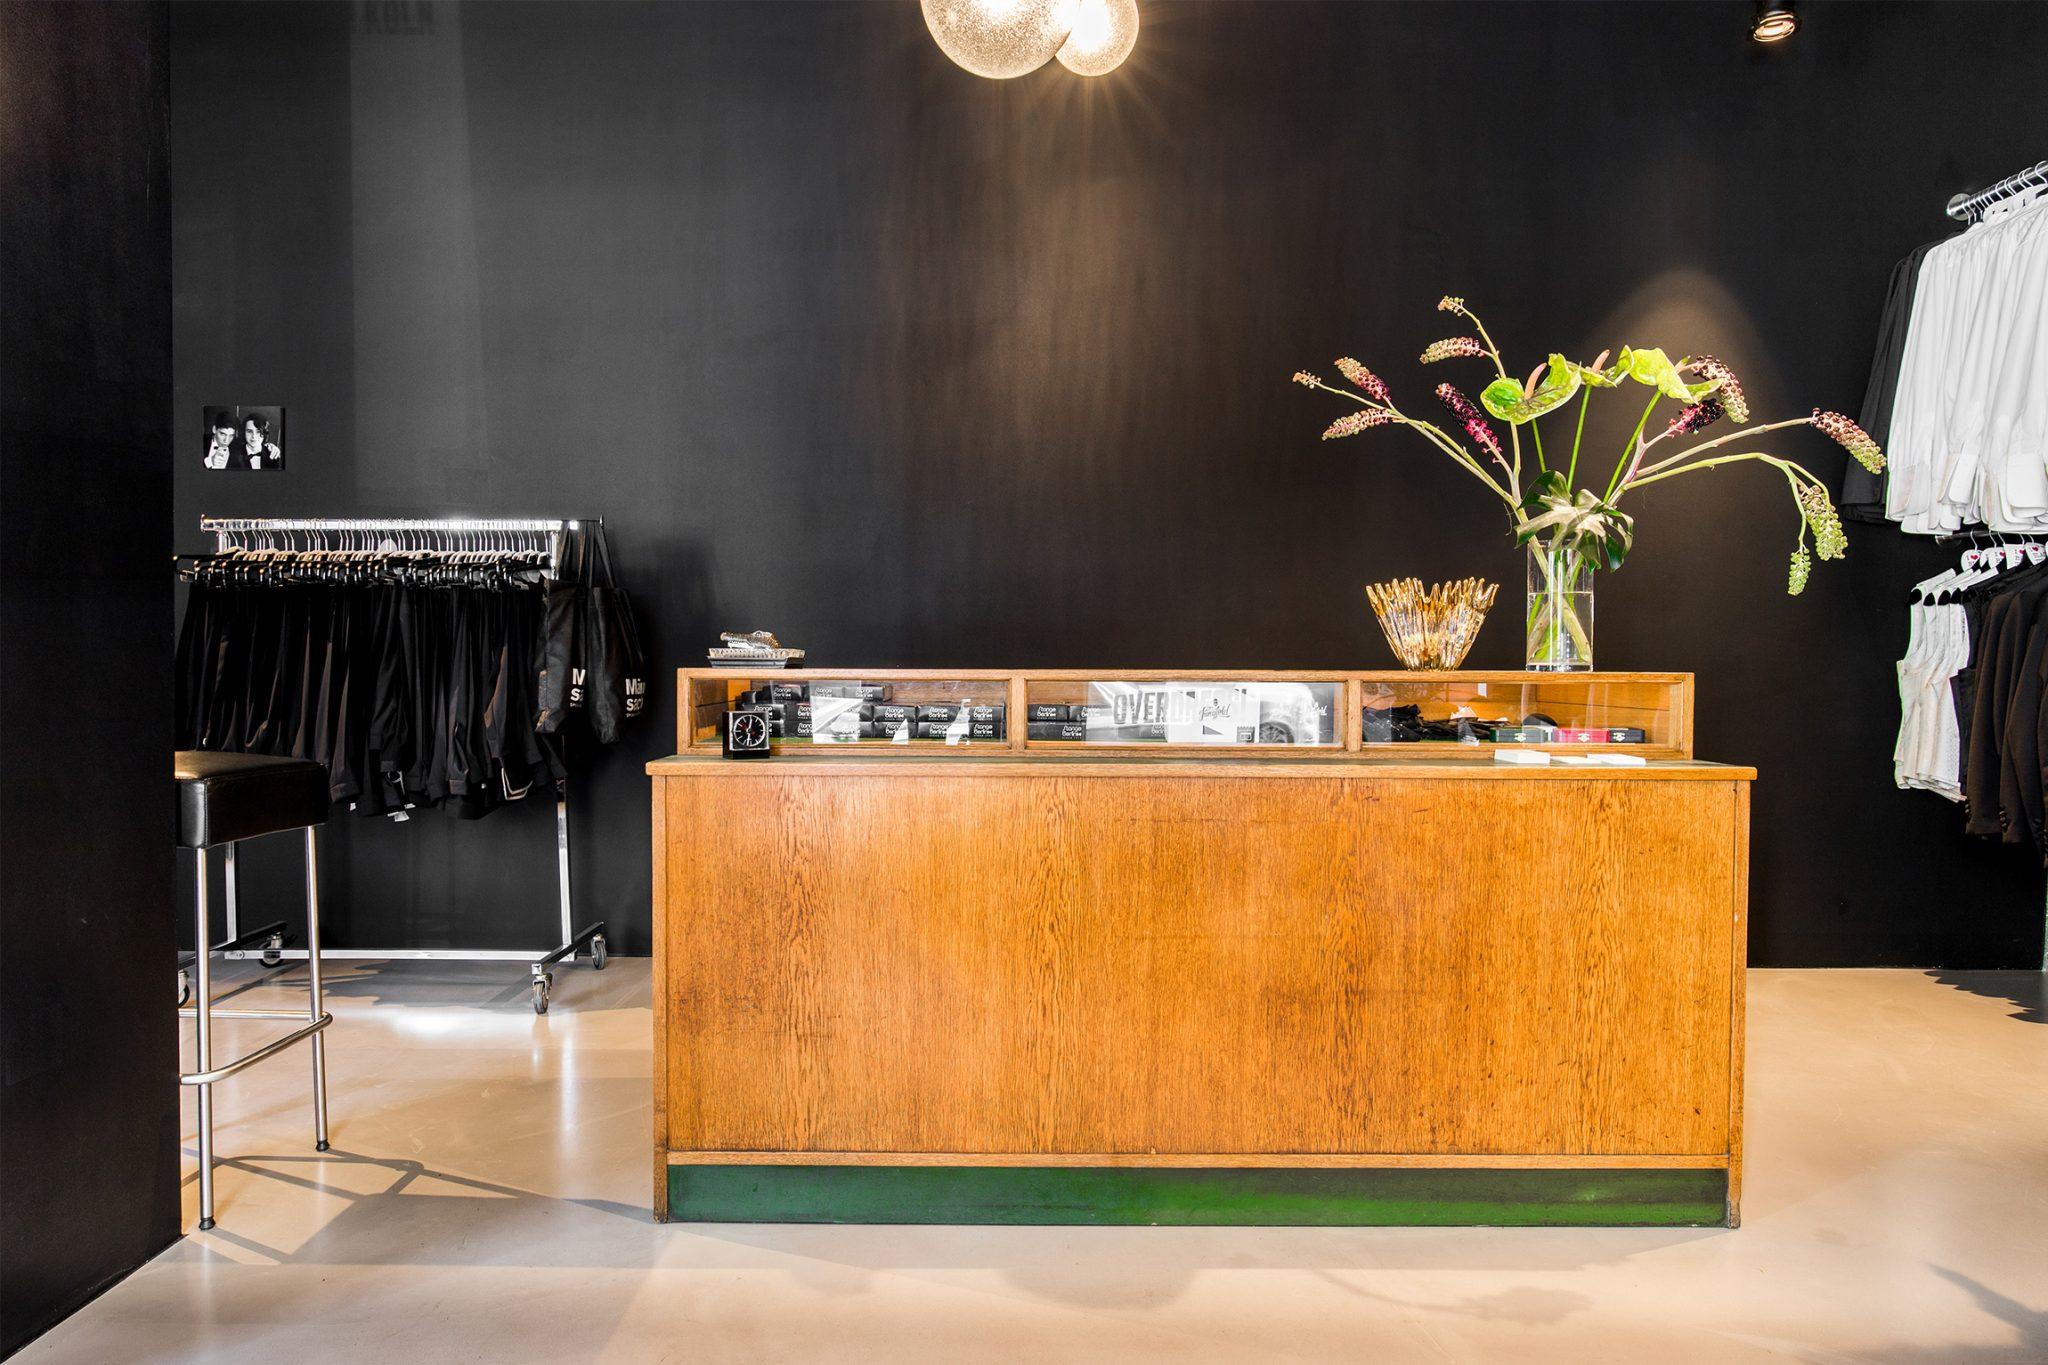 Smokingverleih Köln, Interior Design, StilManipulation 2018, IlovetheBlacktie